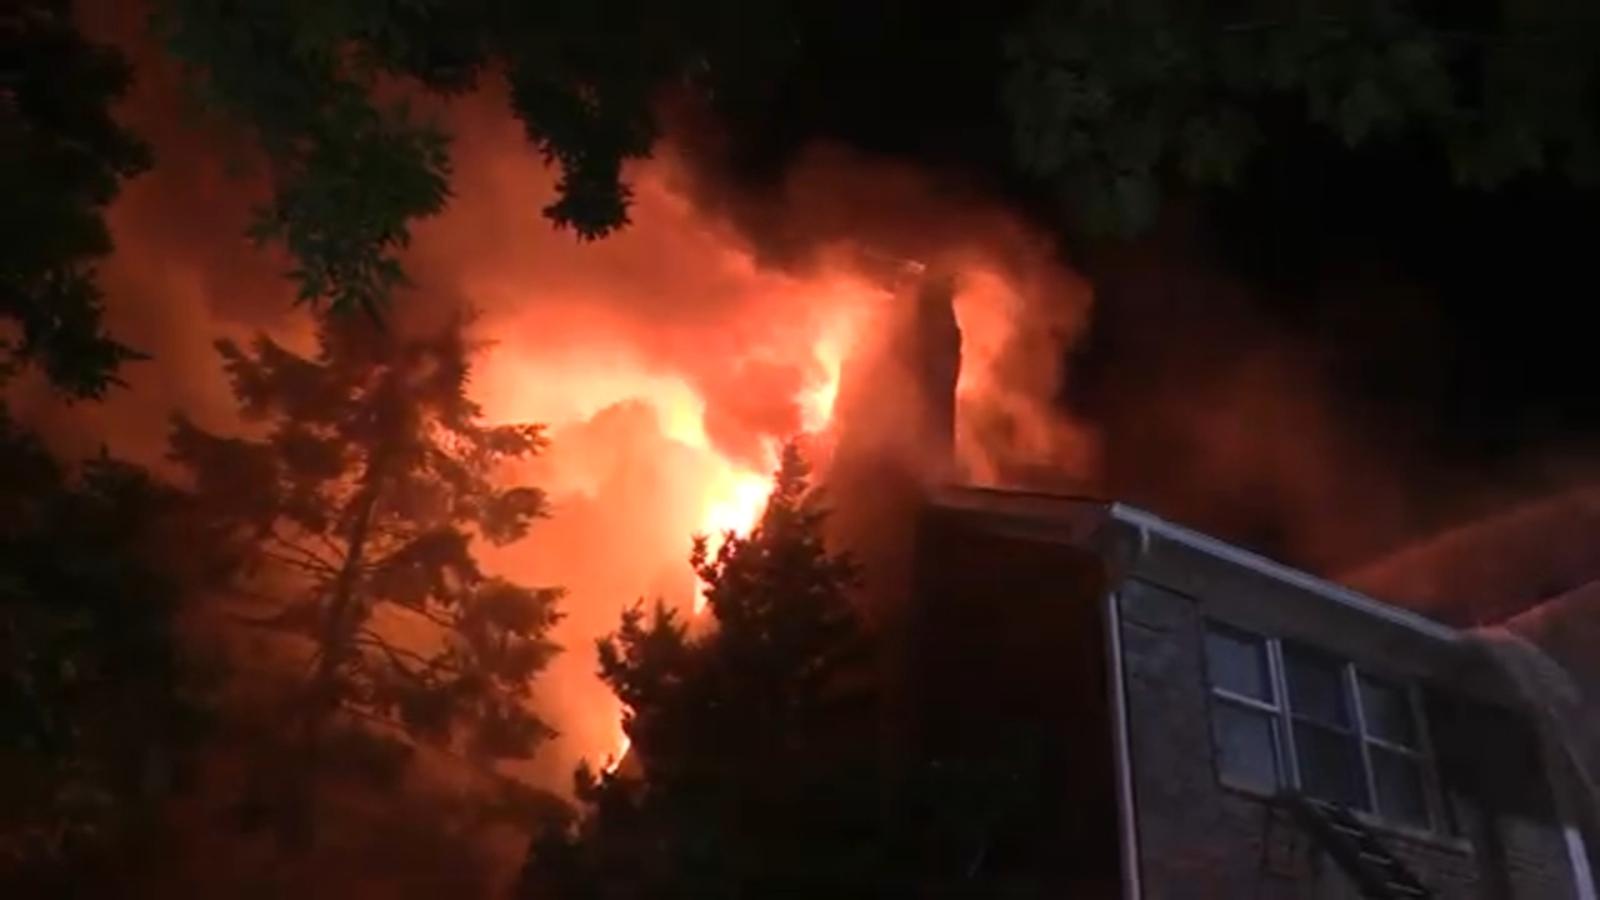 Massive fire destroys Burr Ridge home, estimated half-million in damage, officials say